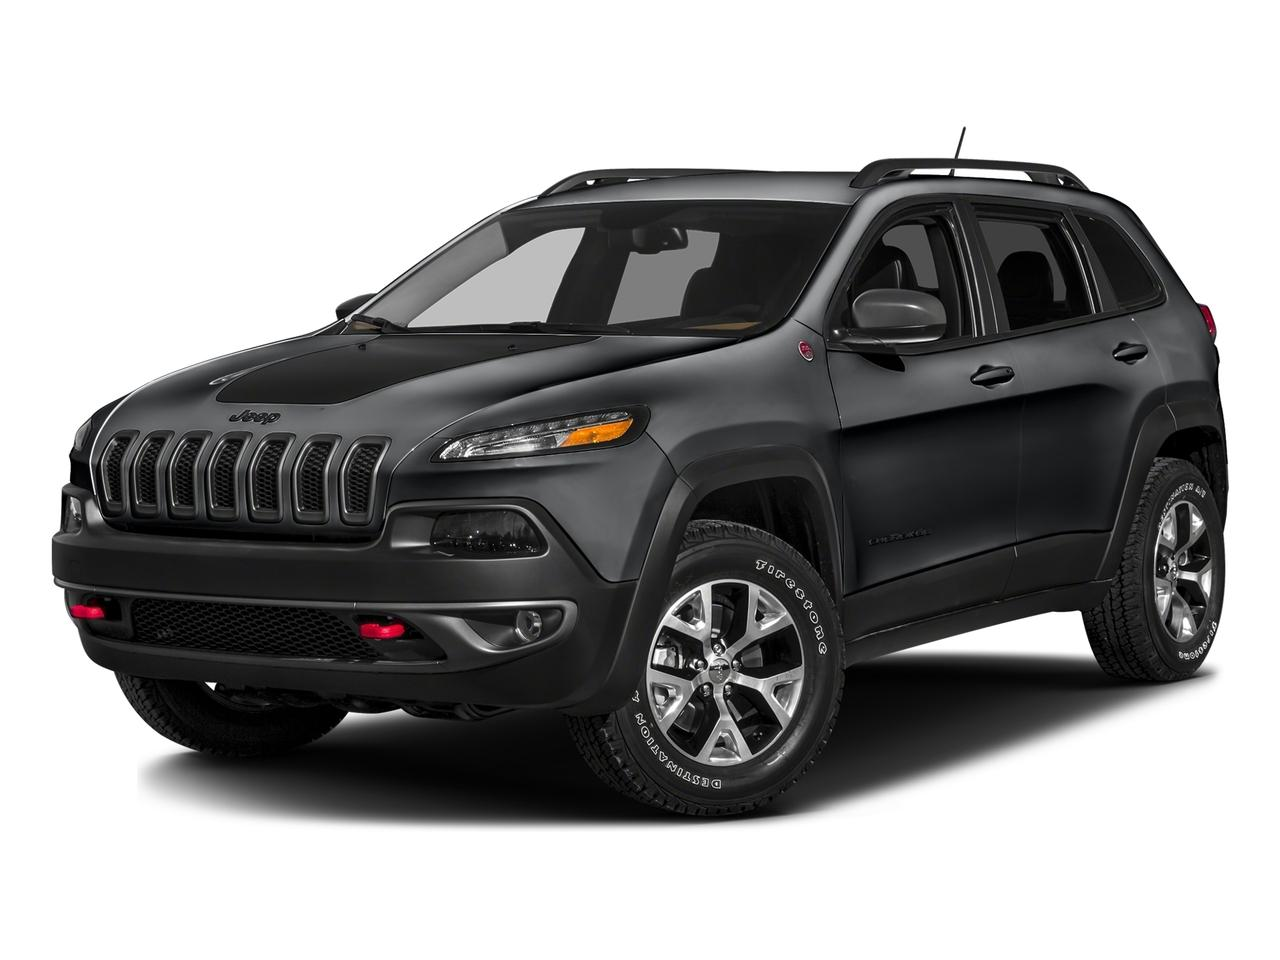 2017 Jeep Cherokee Vehicle Photo in Joliet, IL 60586